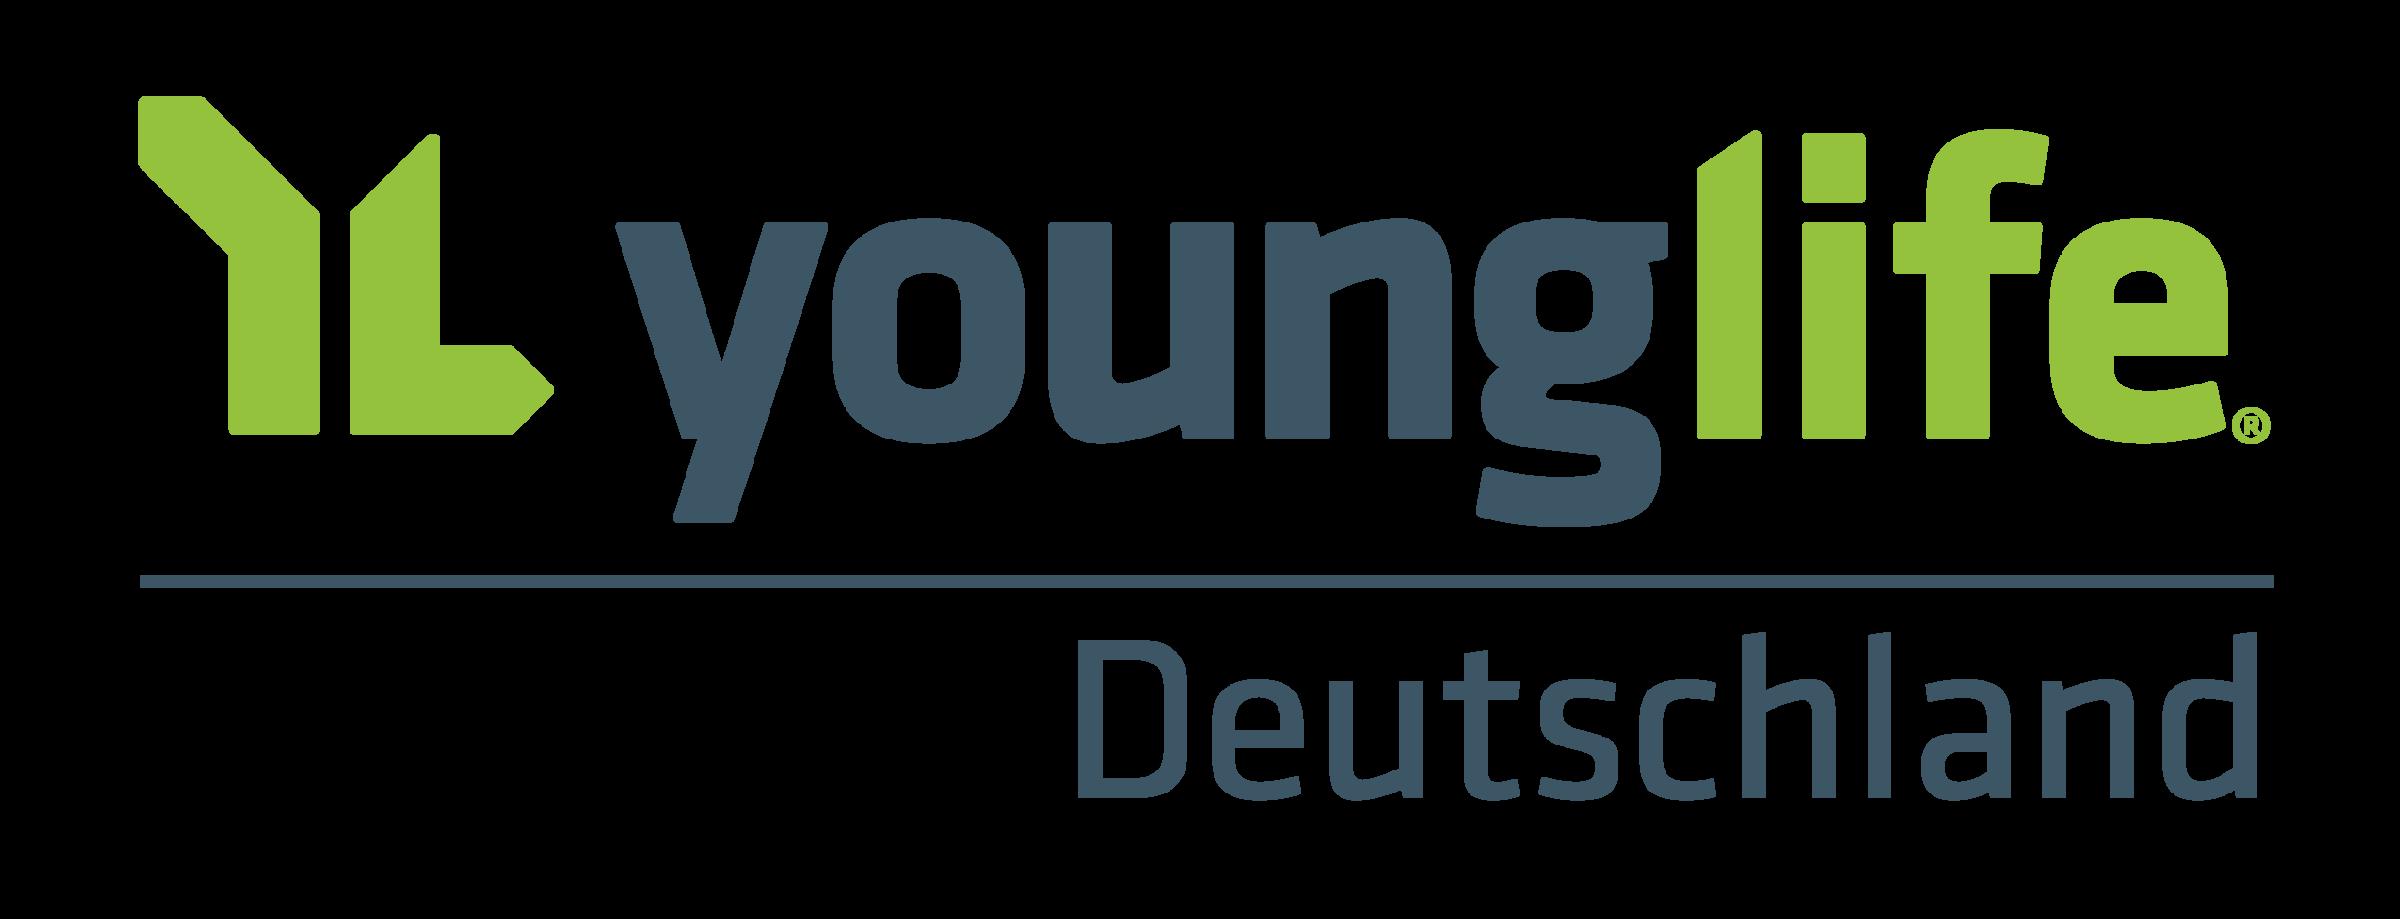 Young Life Deutschland Logo